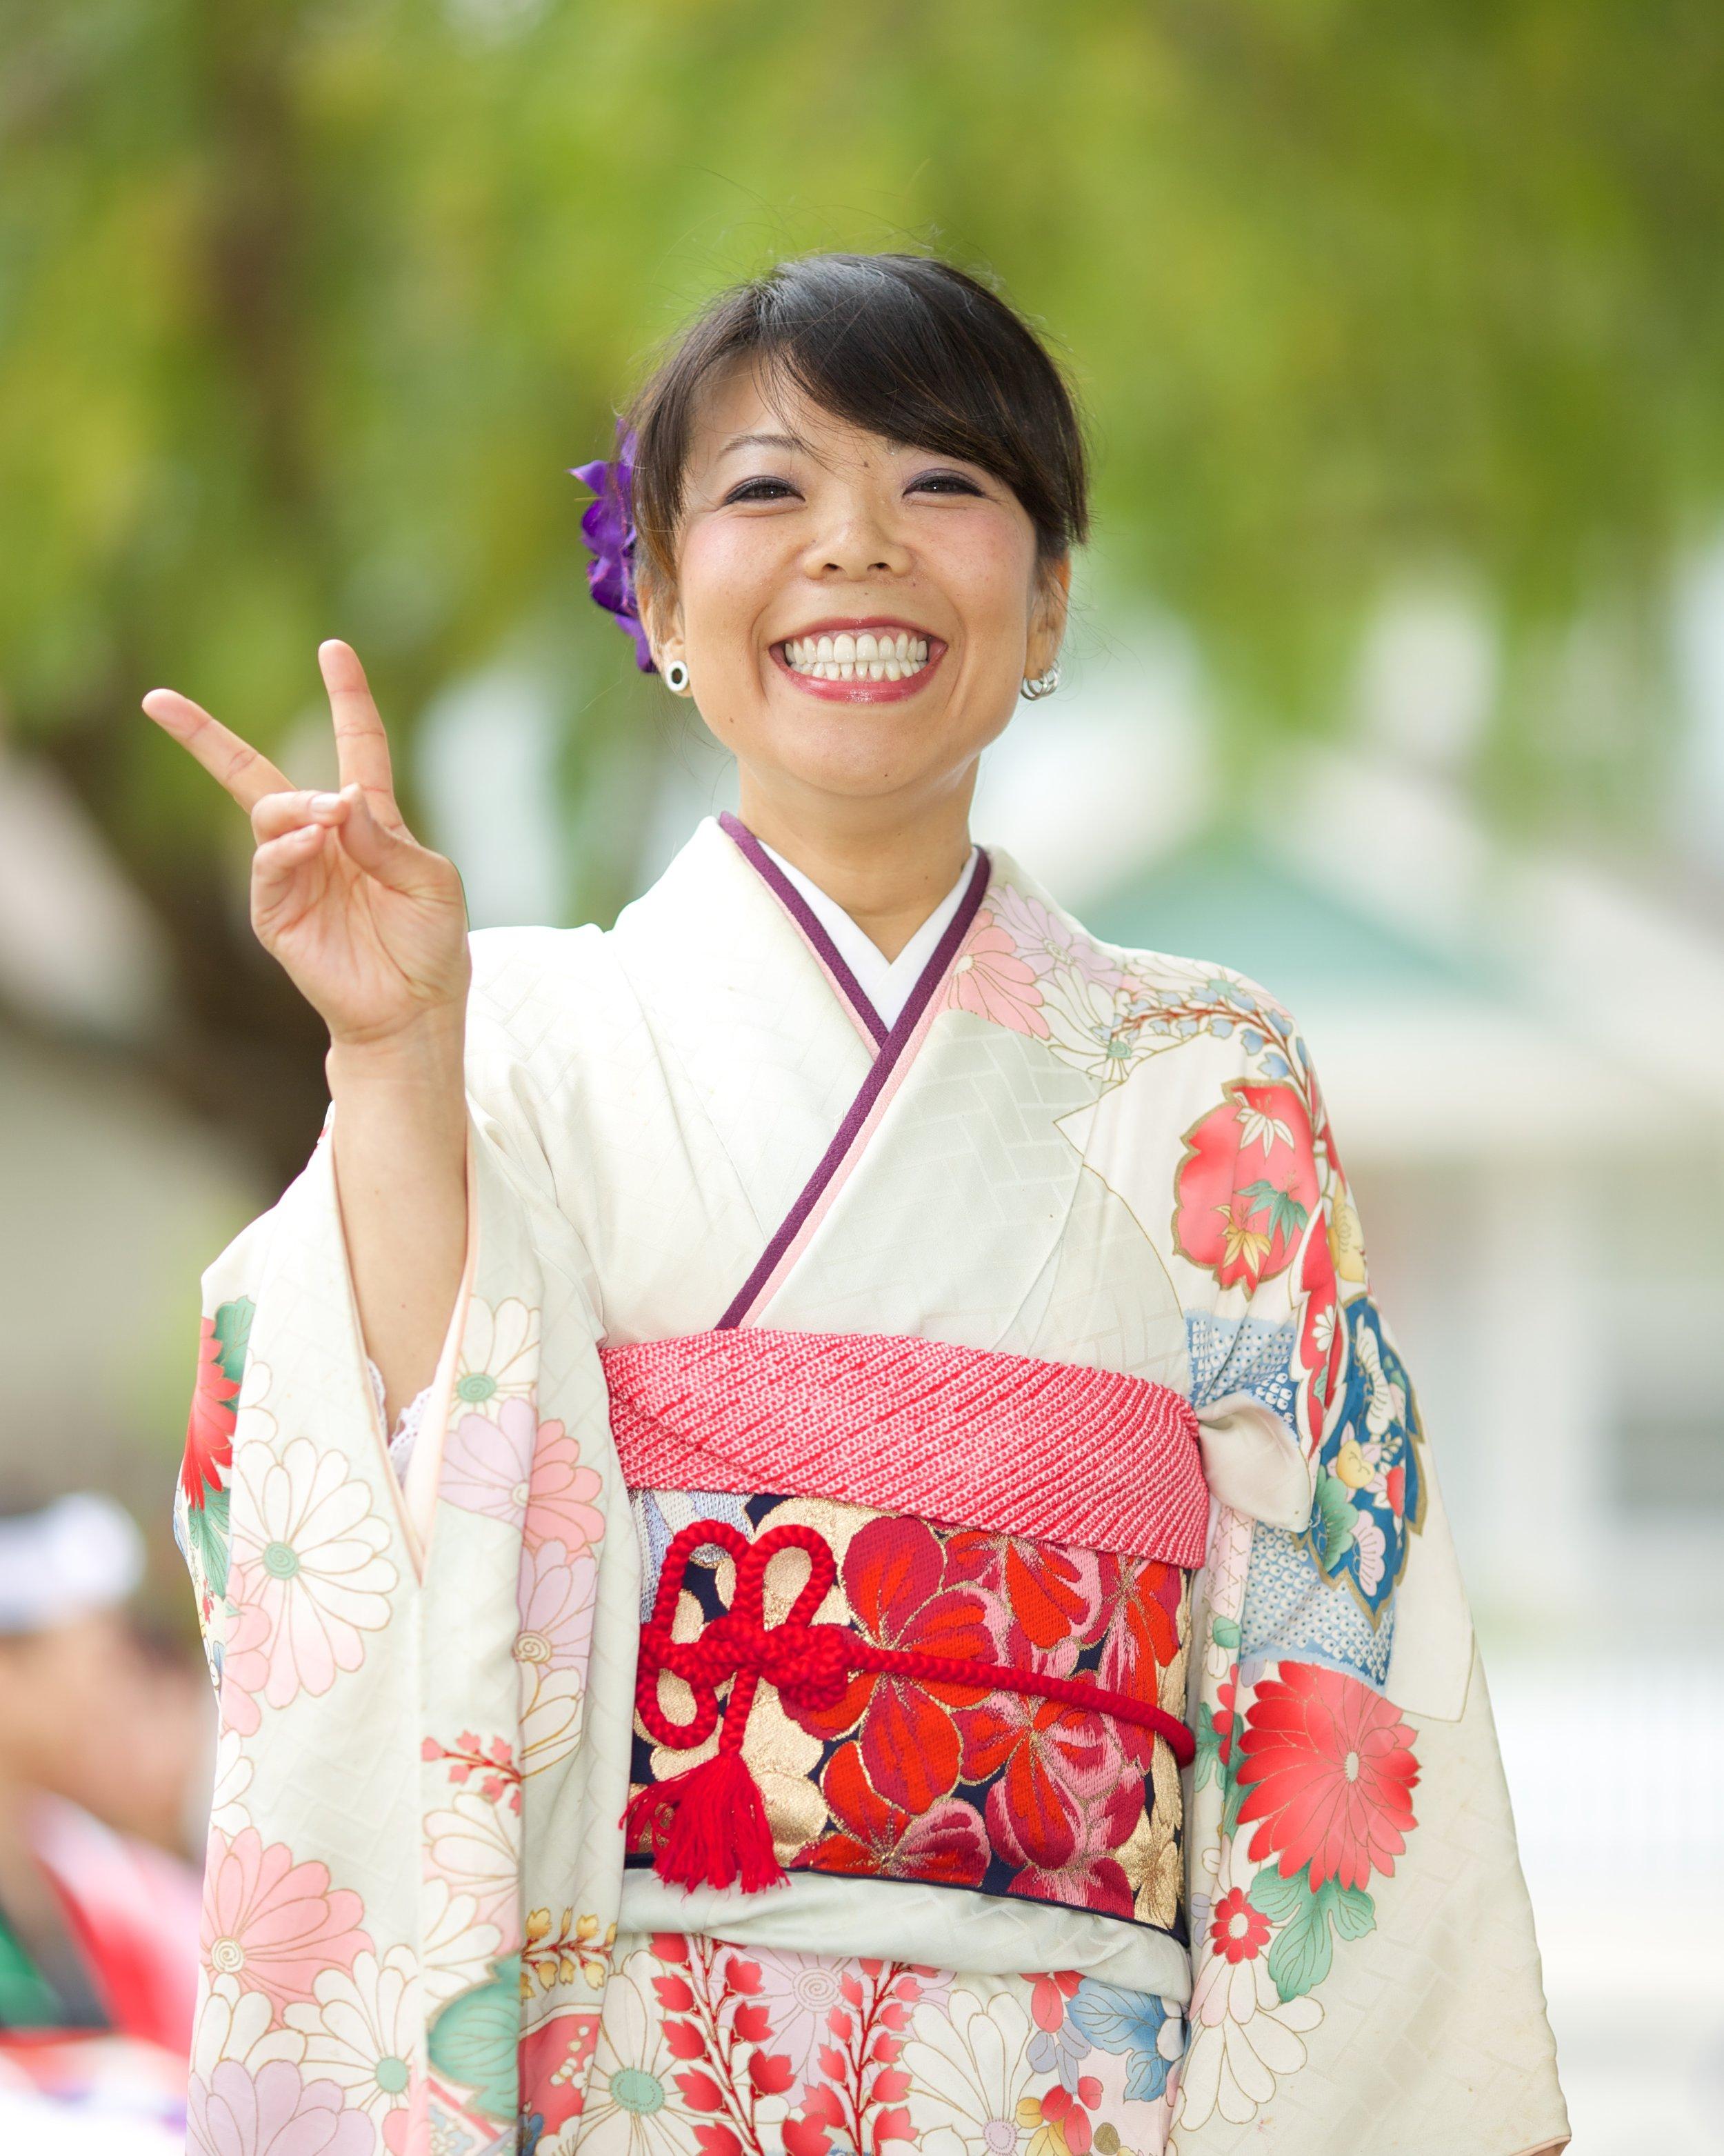 natsu-summer---matsutoyo-kai---japanese-cultural-fair-of-santa-cruz-2015_19570539426_o.jpg